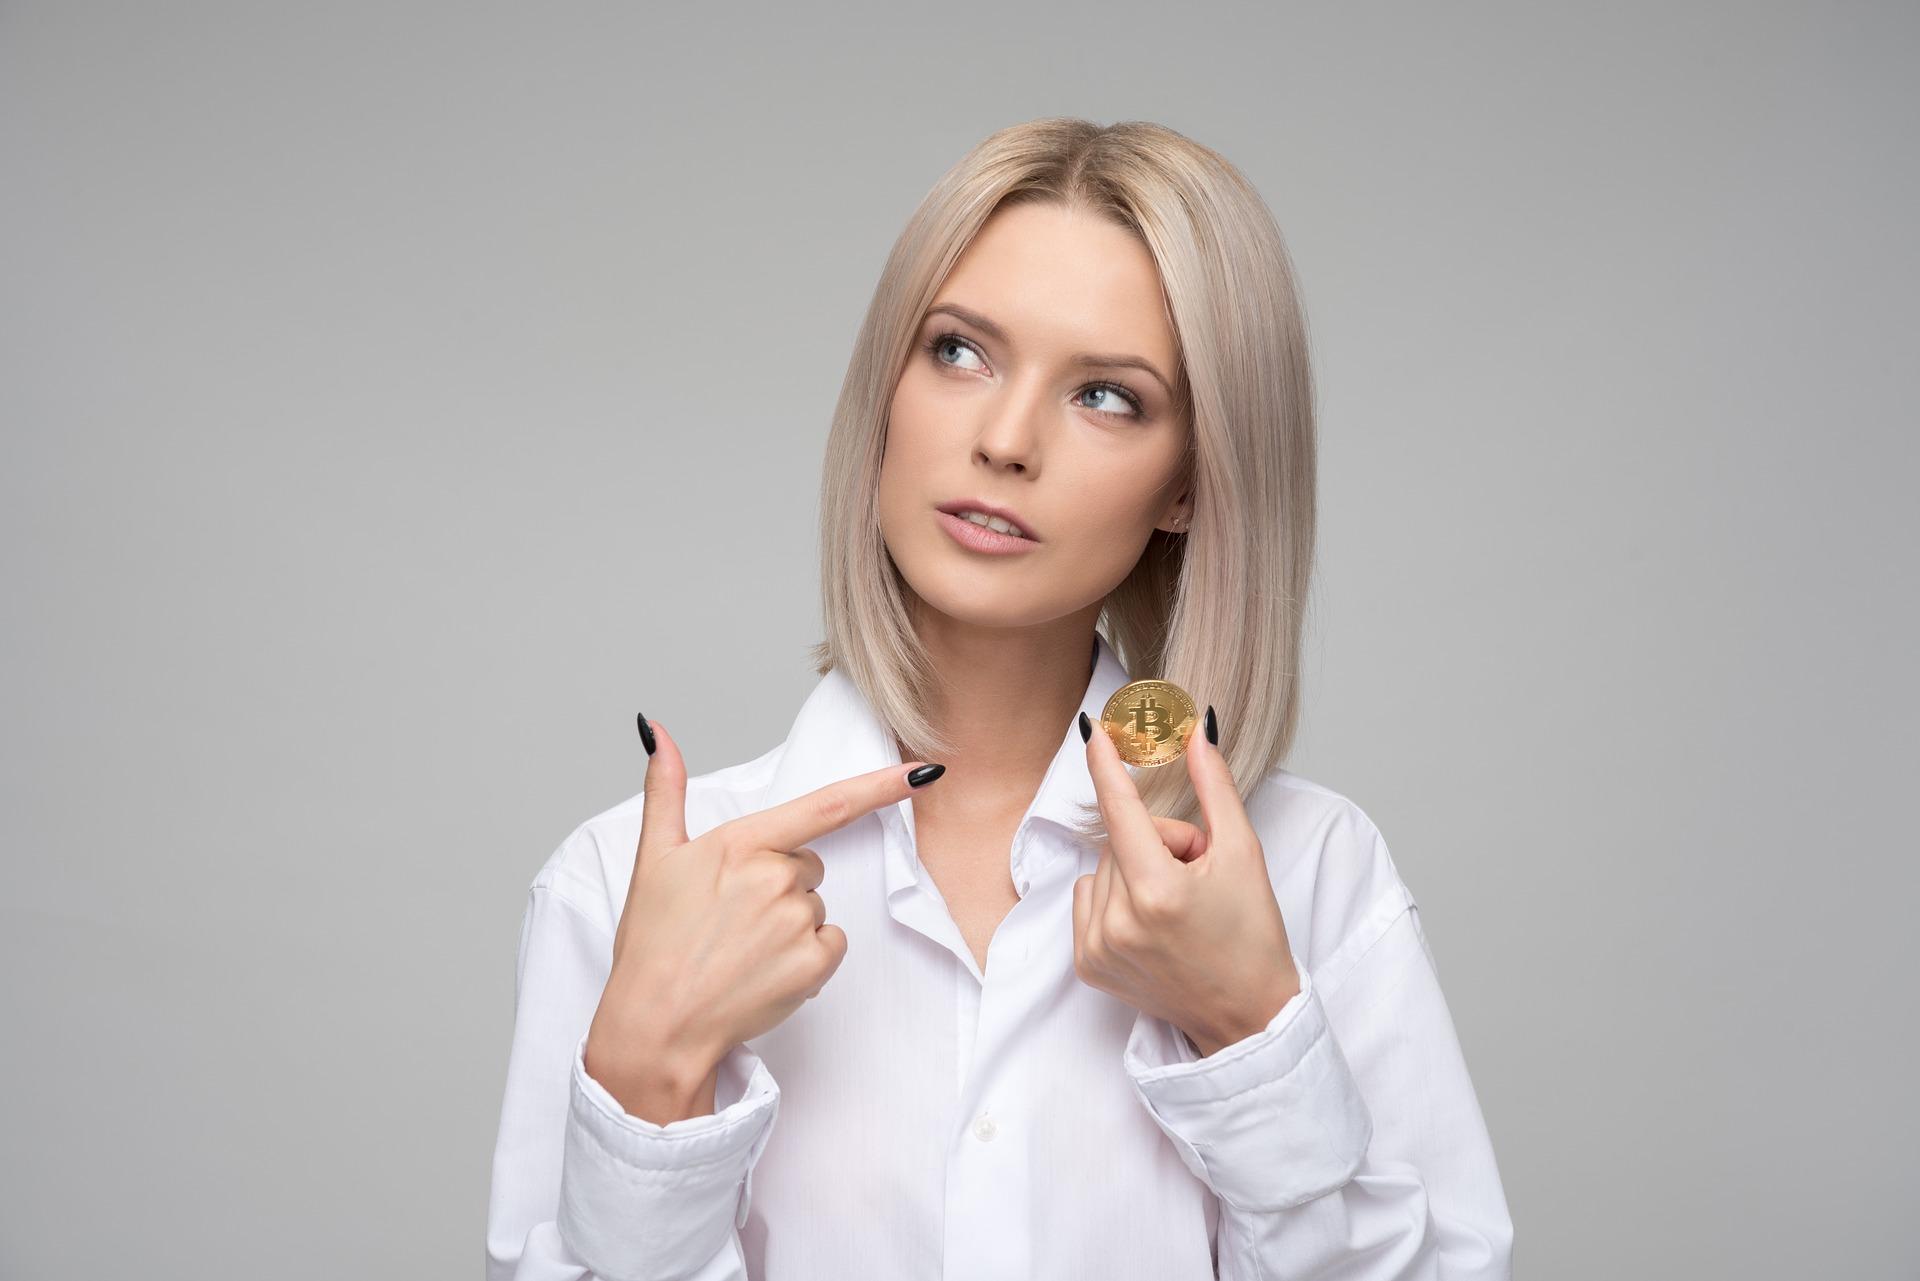 mrežni posrednik za kriptovalute kako znati kada ulagati u kriptovalutu